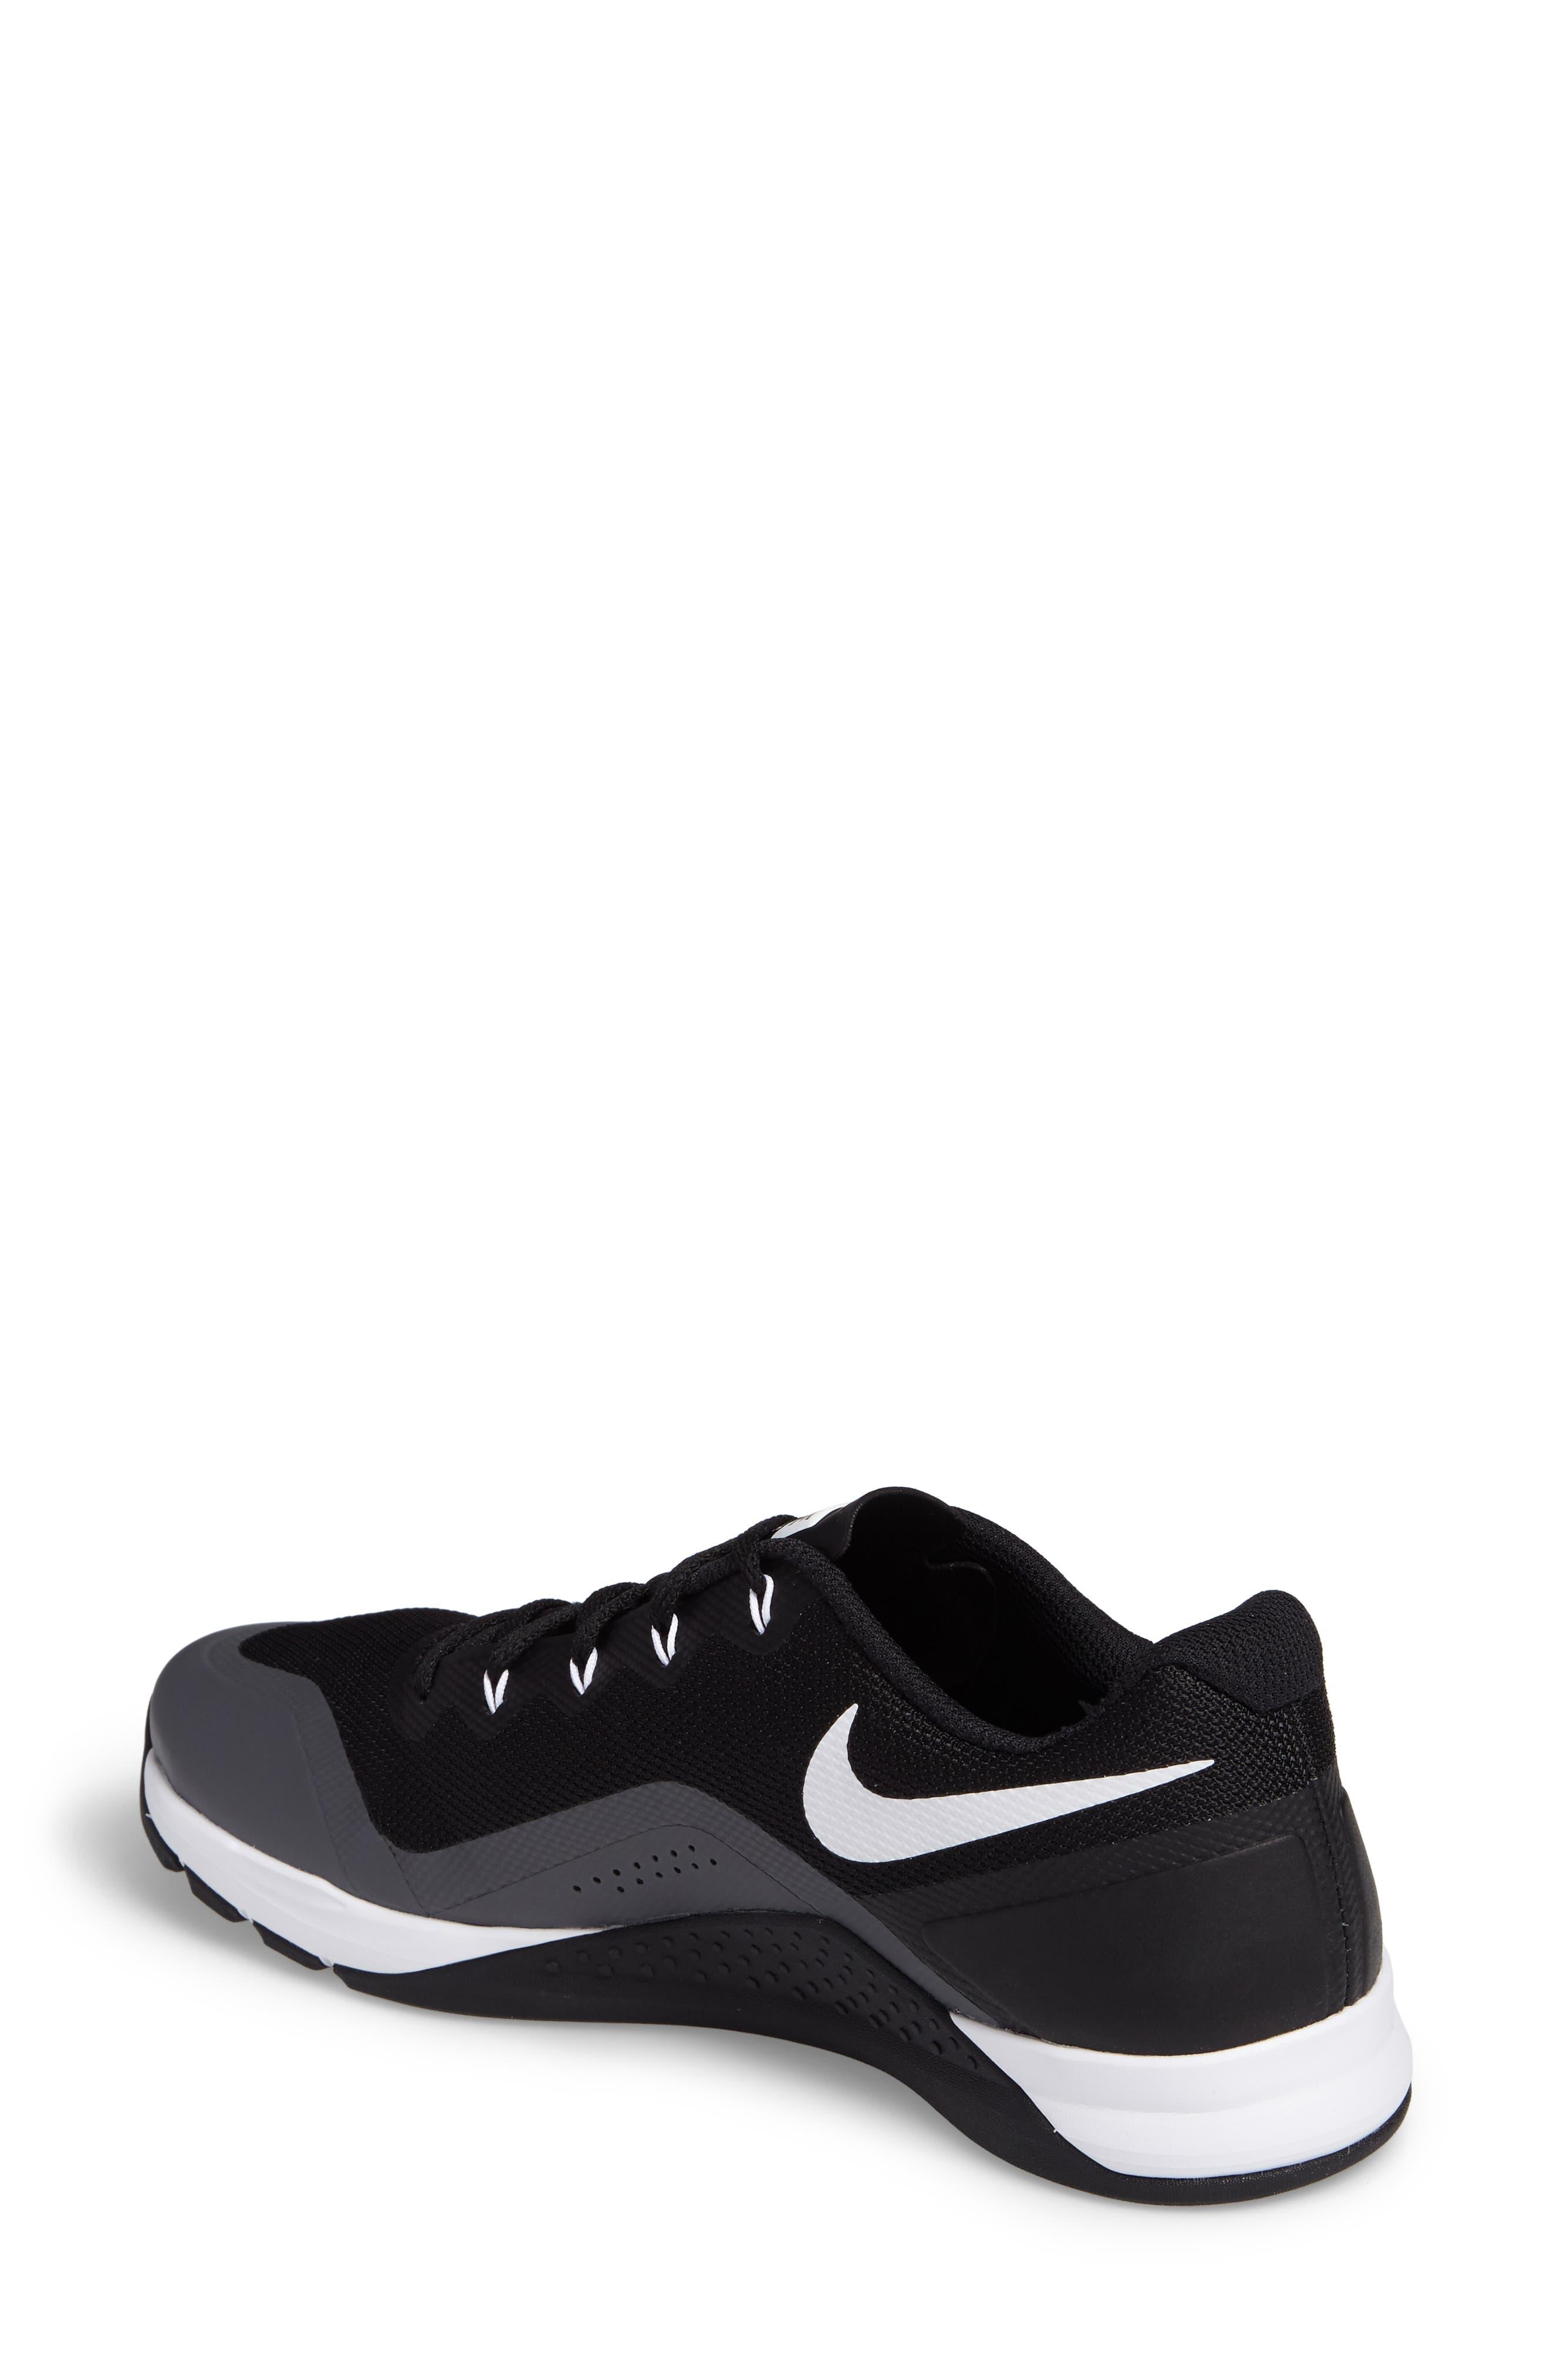 Alternate Image 2  - Nike Metcon Repper DSX Training Shoe (Women)